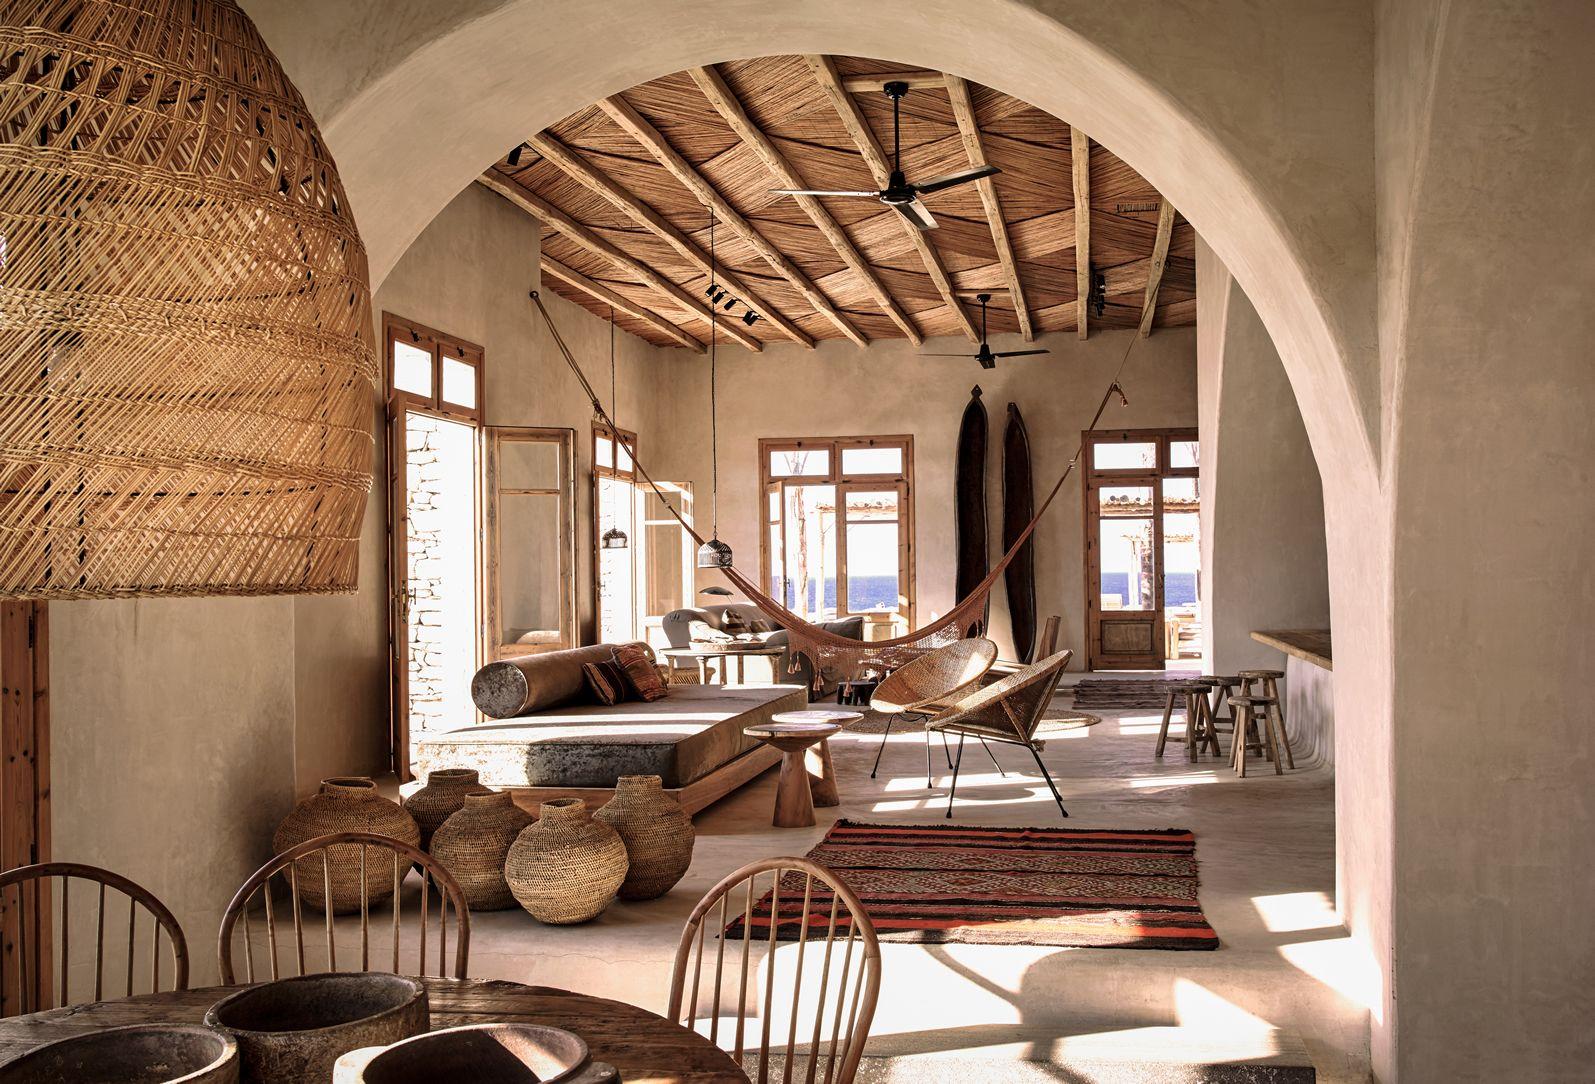 steve.herud.scorpios.house.indoor-2.jpg | Hospitality | Pinterest ...